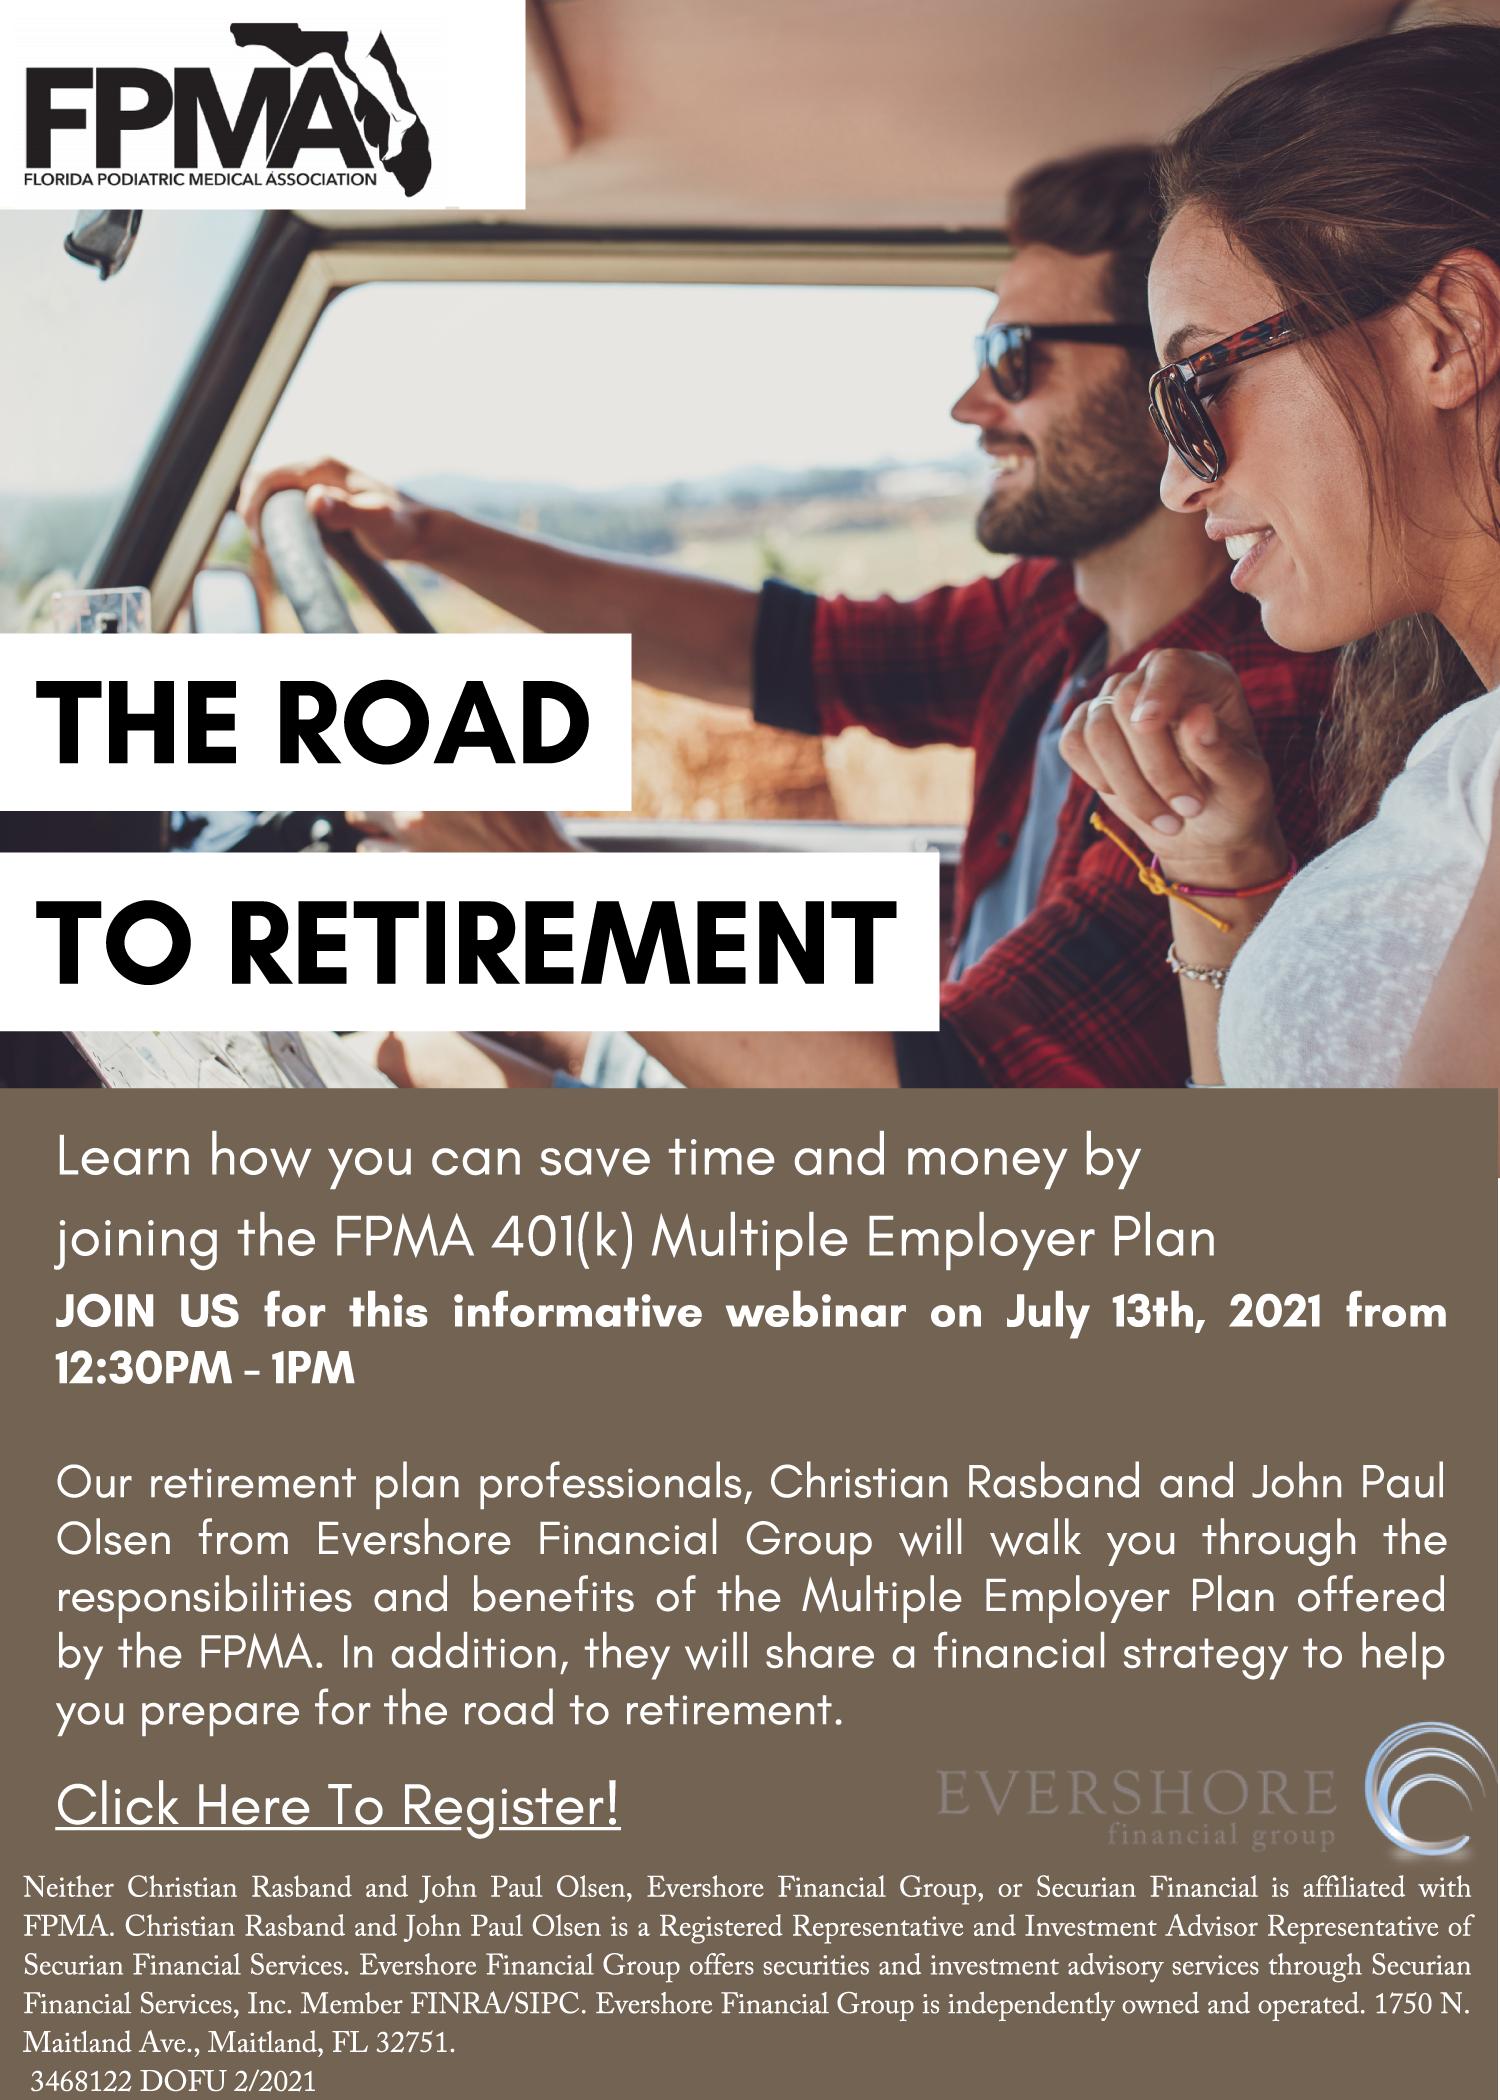 Road to Retirement Webinar graphic